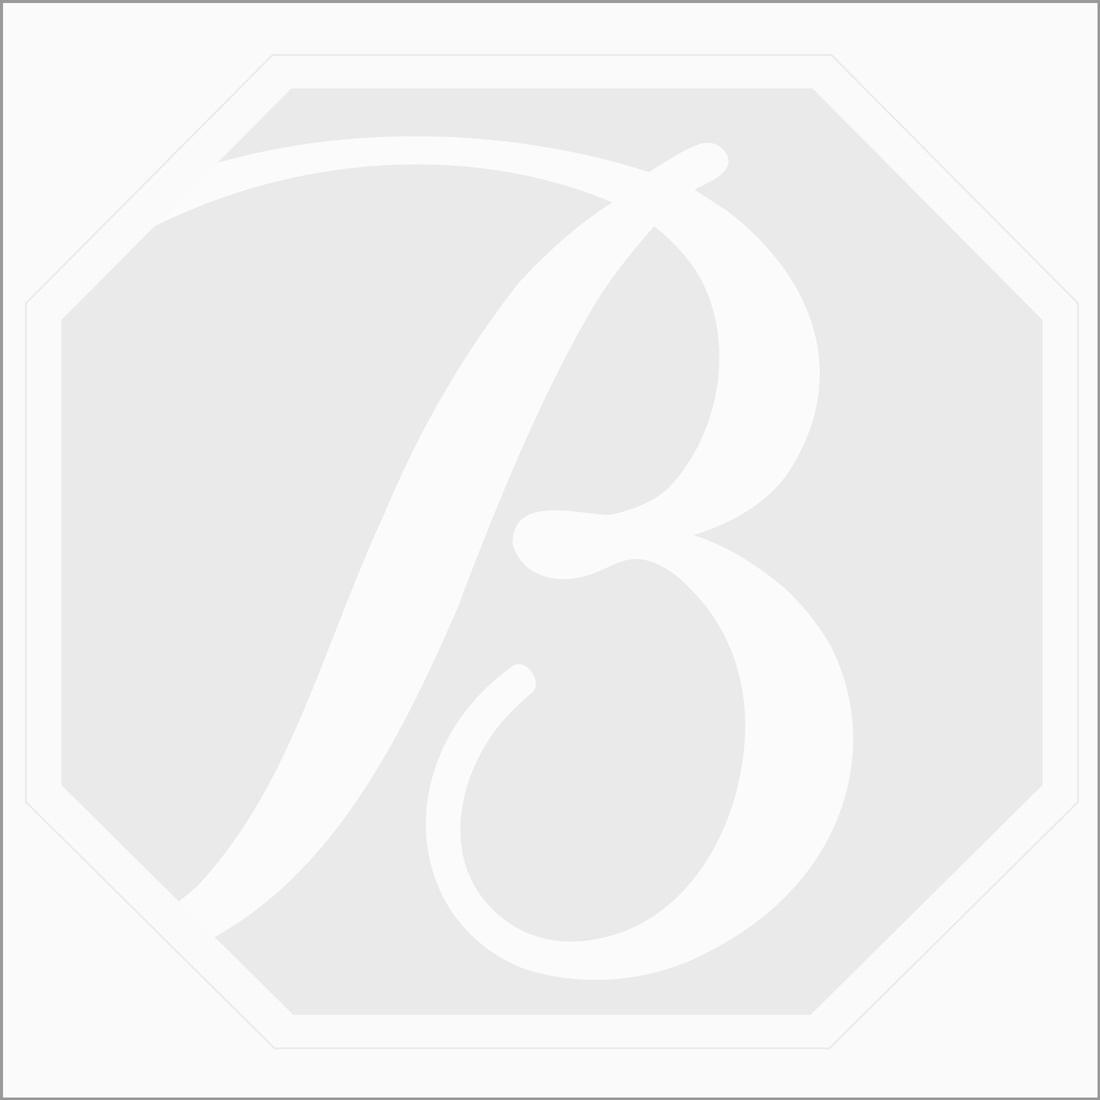 12.80 x 15 mm - Bi-Color (Watermelon) Tourmaline High Dome Cut - 1 Piece - 22.45 carats (ToCab1011)